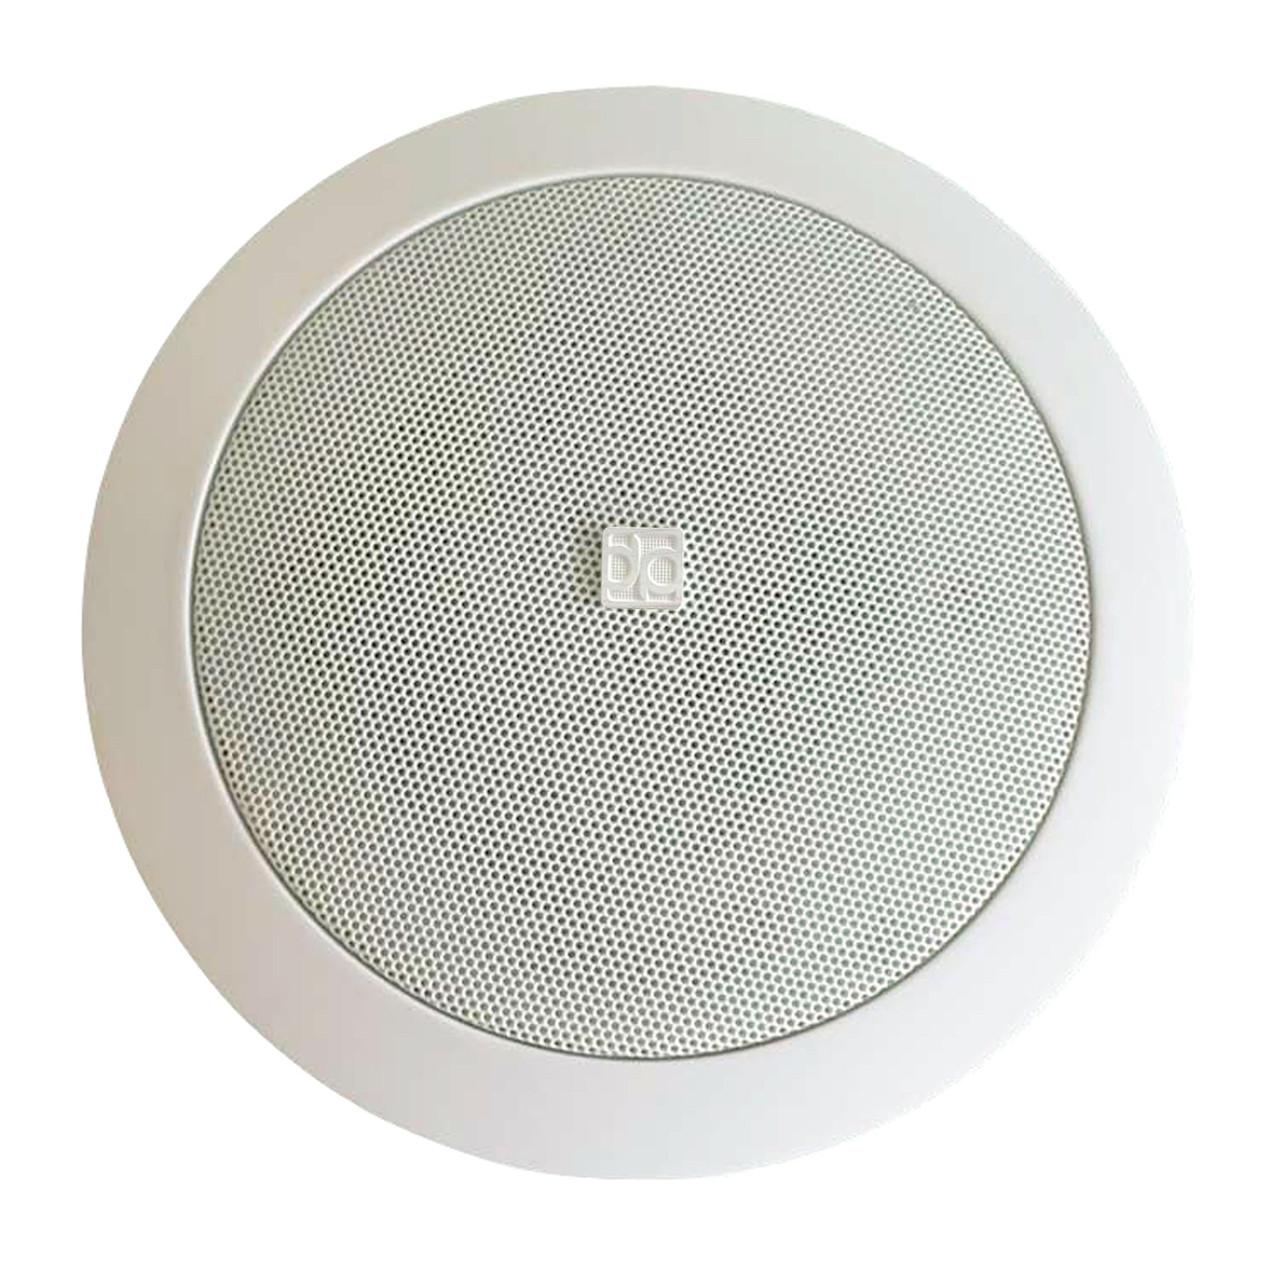 Ремонт DIRECT POWER TECHNOLOGY DP-25 4`+1.5.